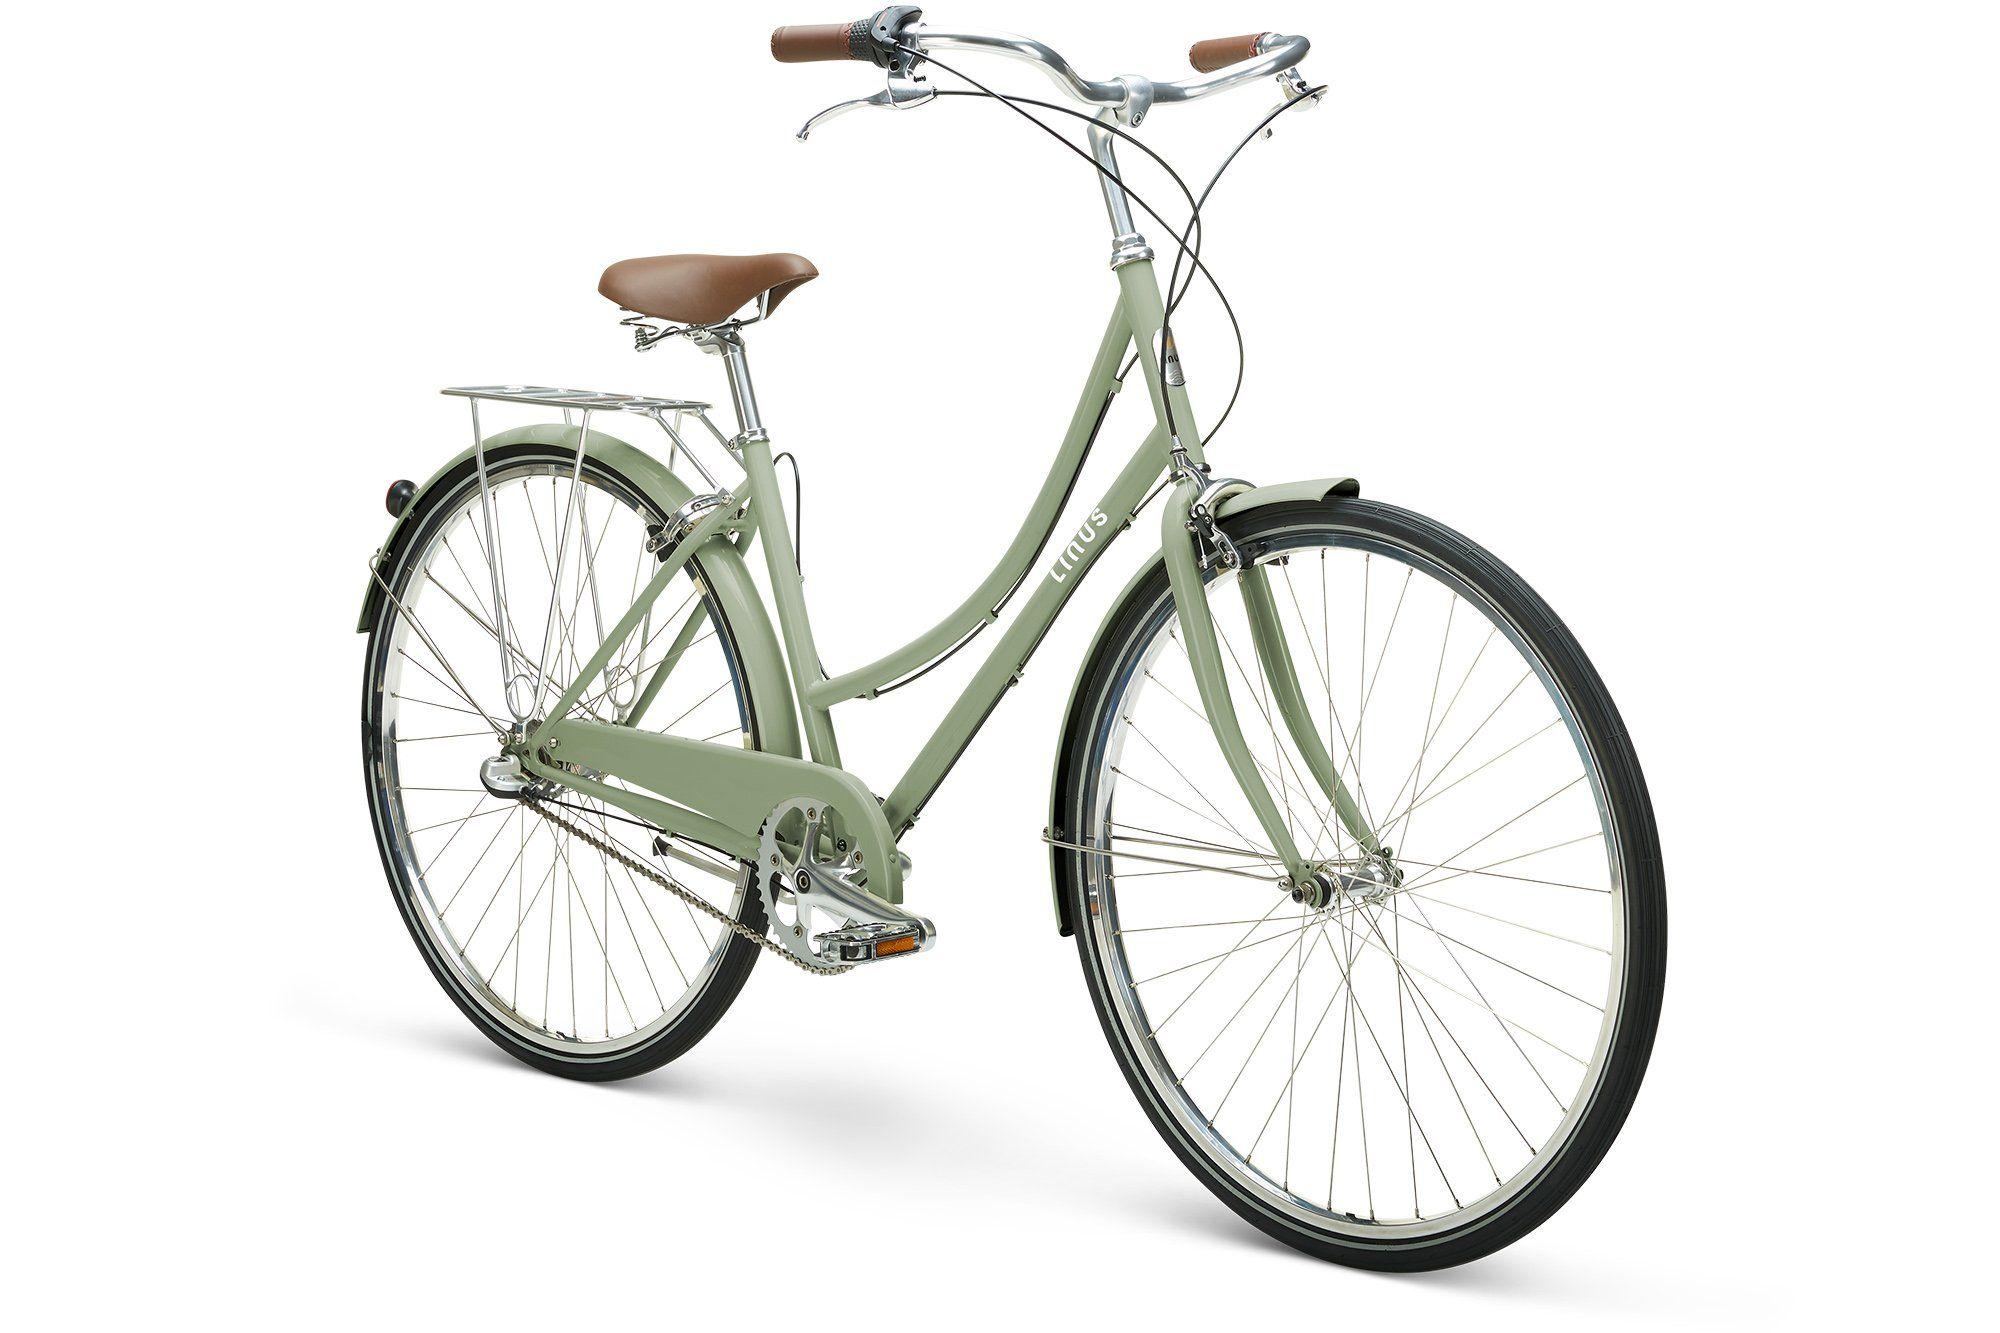 Dutchi 3i In 2020 Bicycle Retro Bicycle Retro Bike